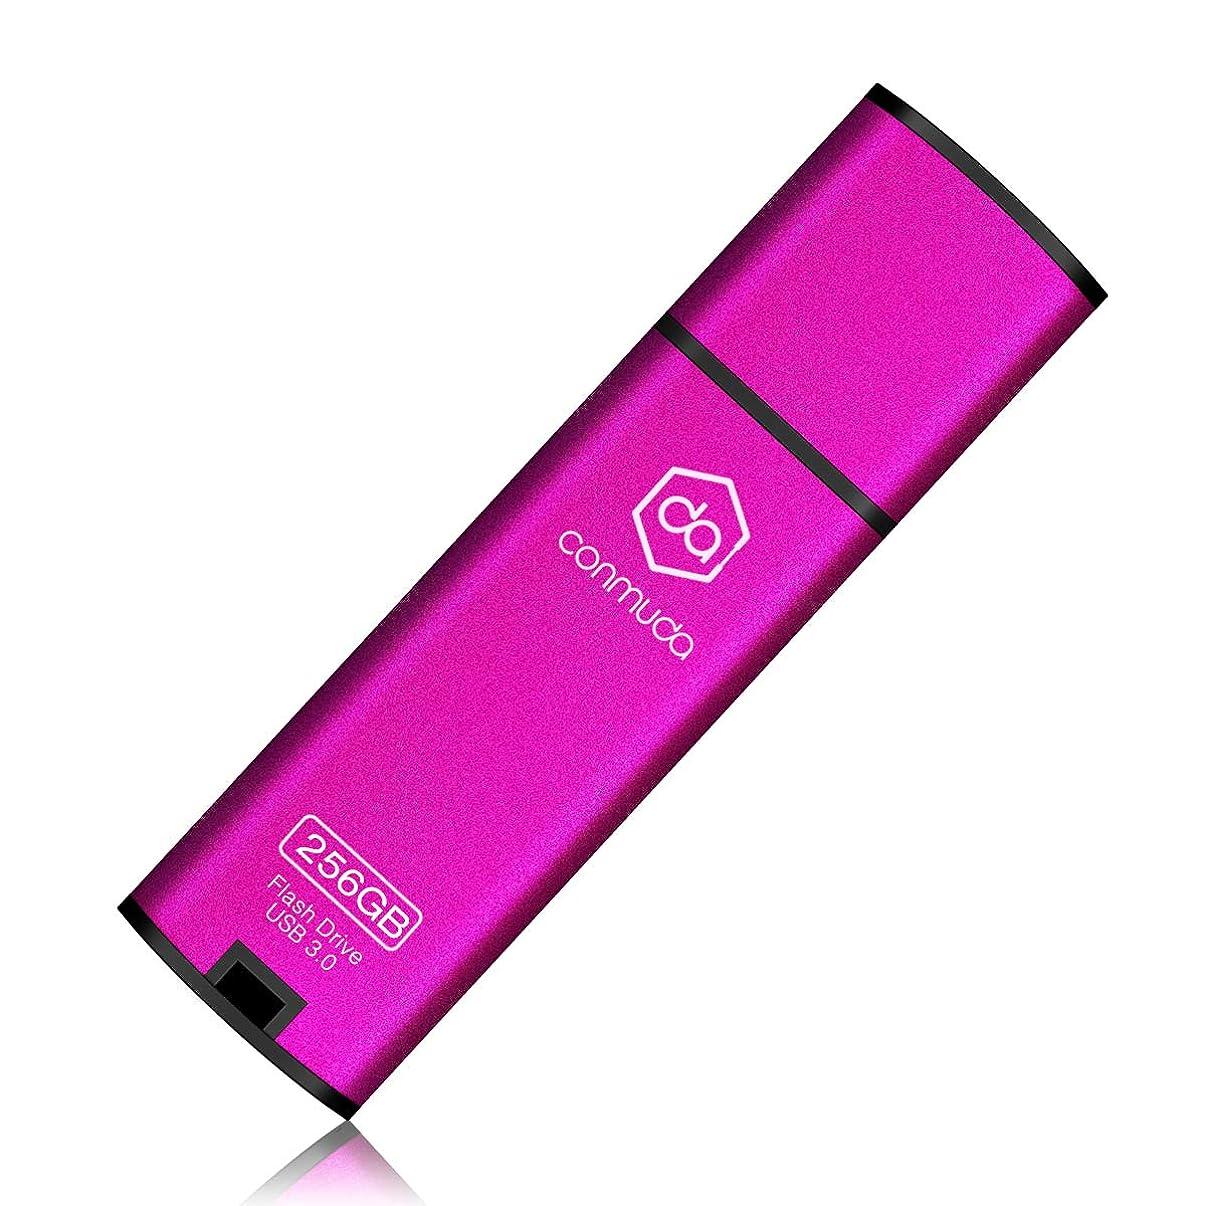 CONMUDA USB 3.0 Flash Drive 128GB Thumb Drive 3.0 Jump Drive Pen Drive Memory Stick Metal High Speed CP08(128gb, Pink)